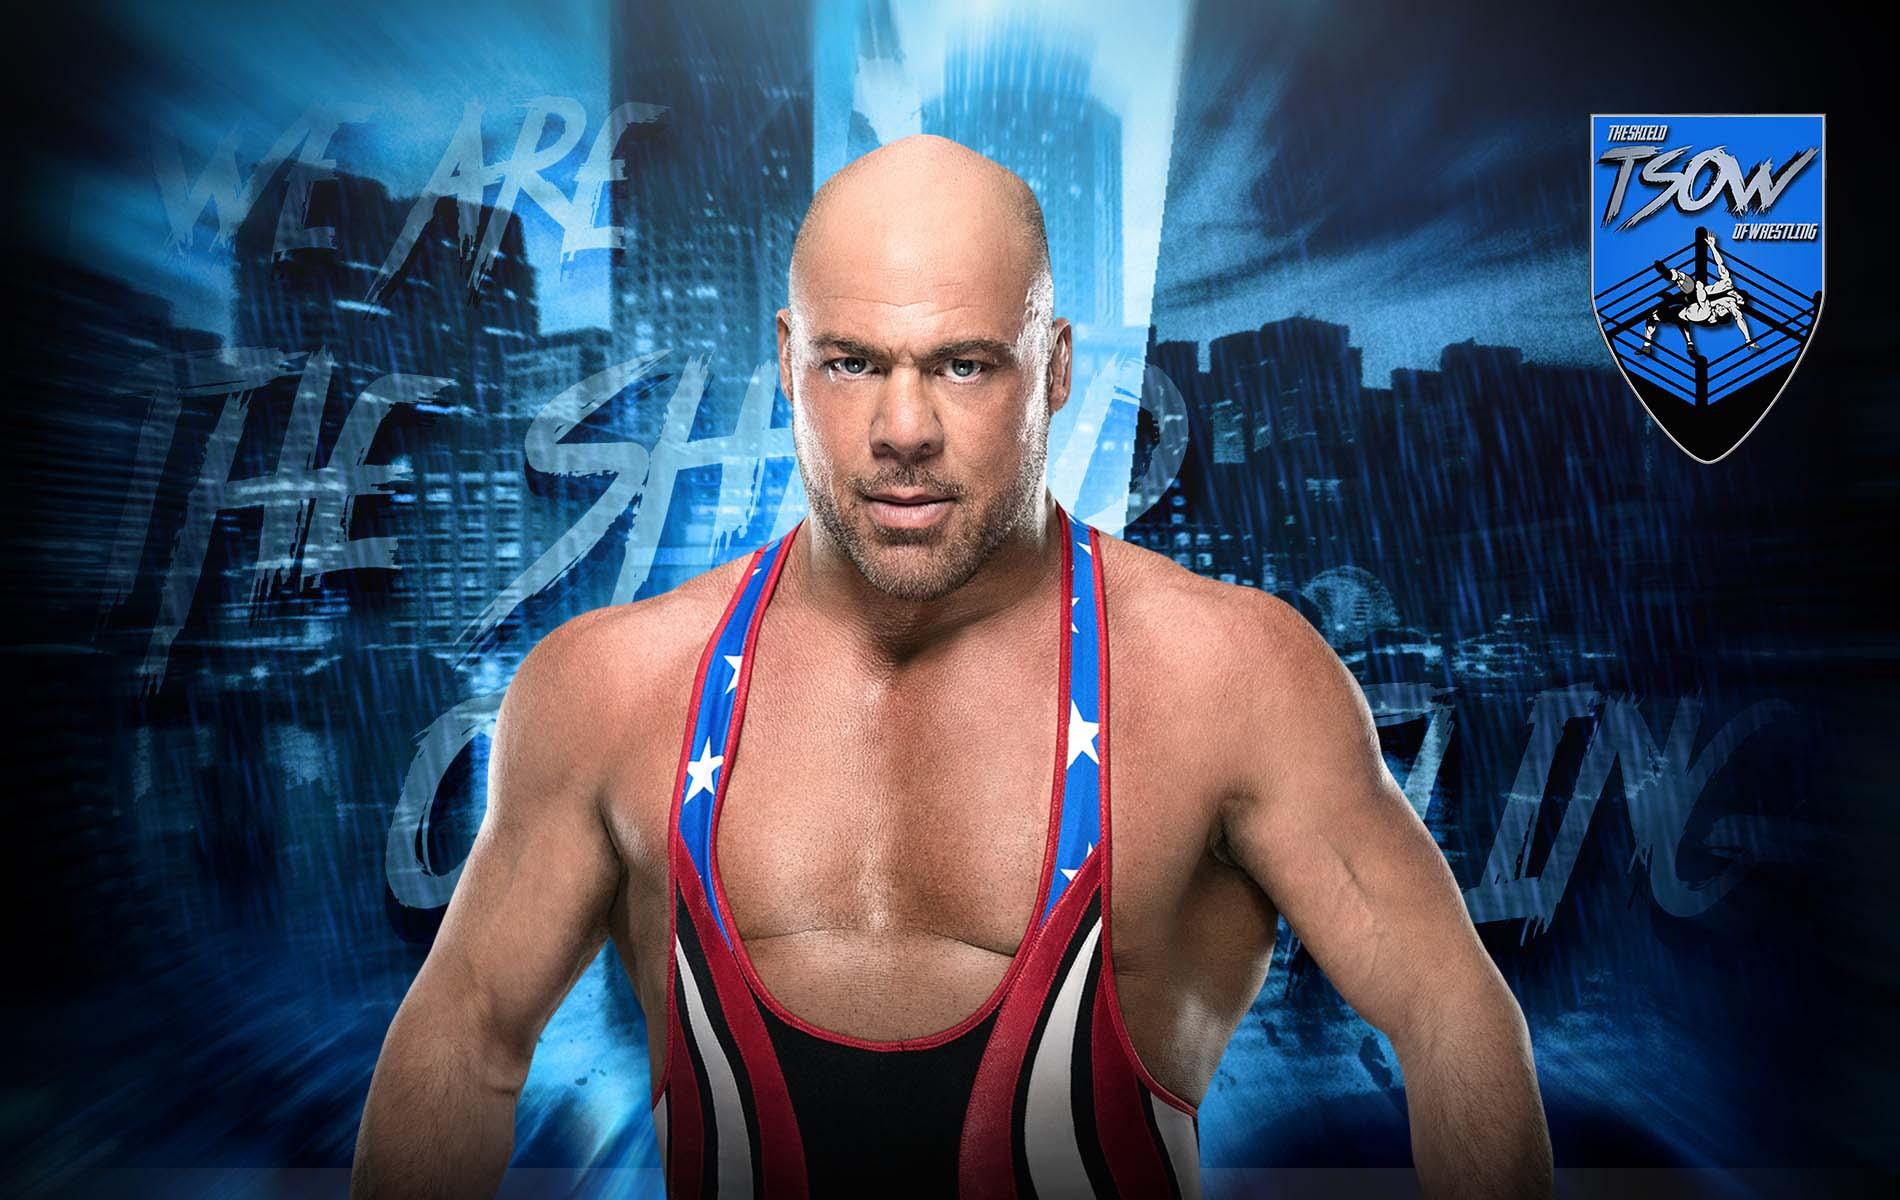 Kurt Angle voleva affrontare Bret Hart a WrestleMania 18